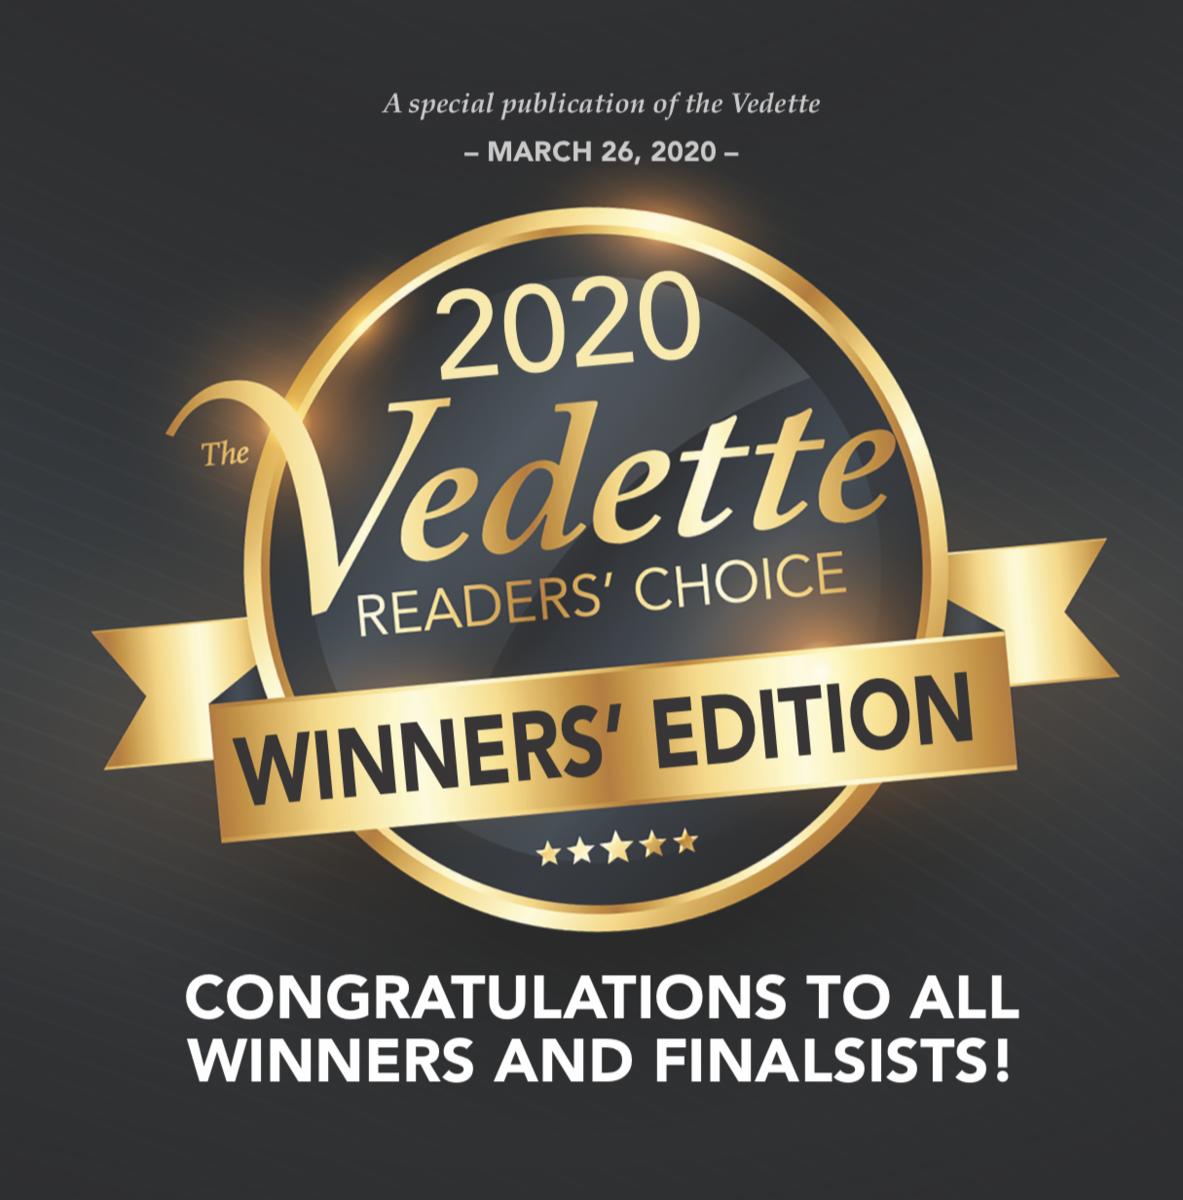 202 0 Winners Edition